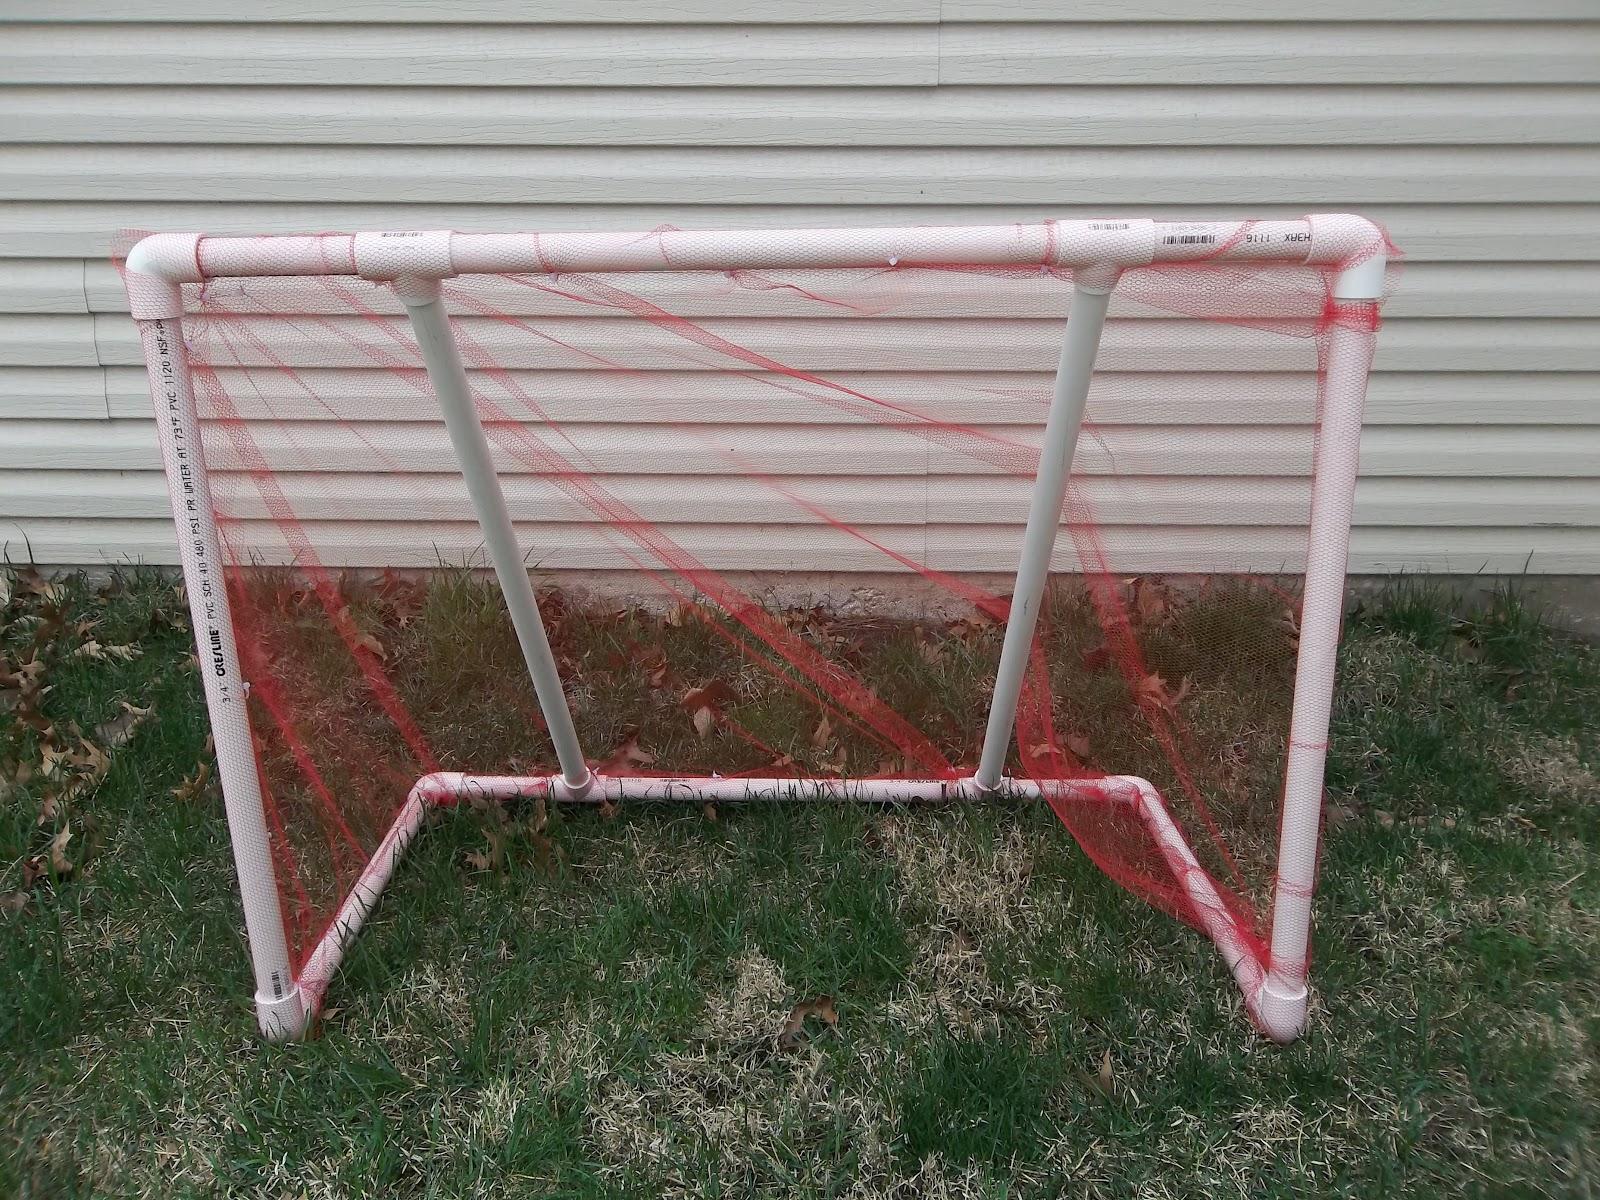 cheap and easy diy pvc pipe soccer goal six sisters u0027 stuff